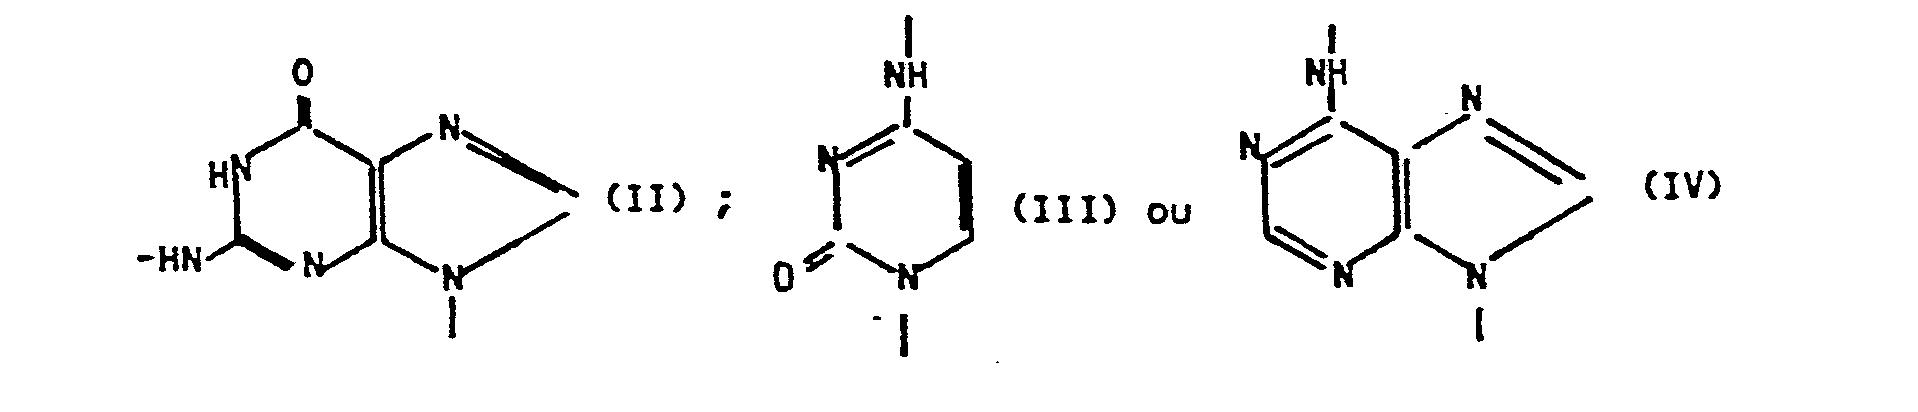 Figure imgb0087